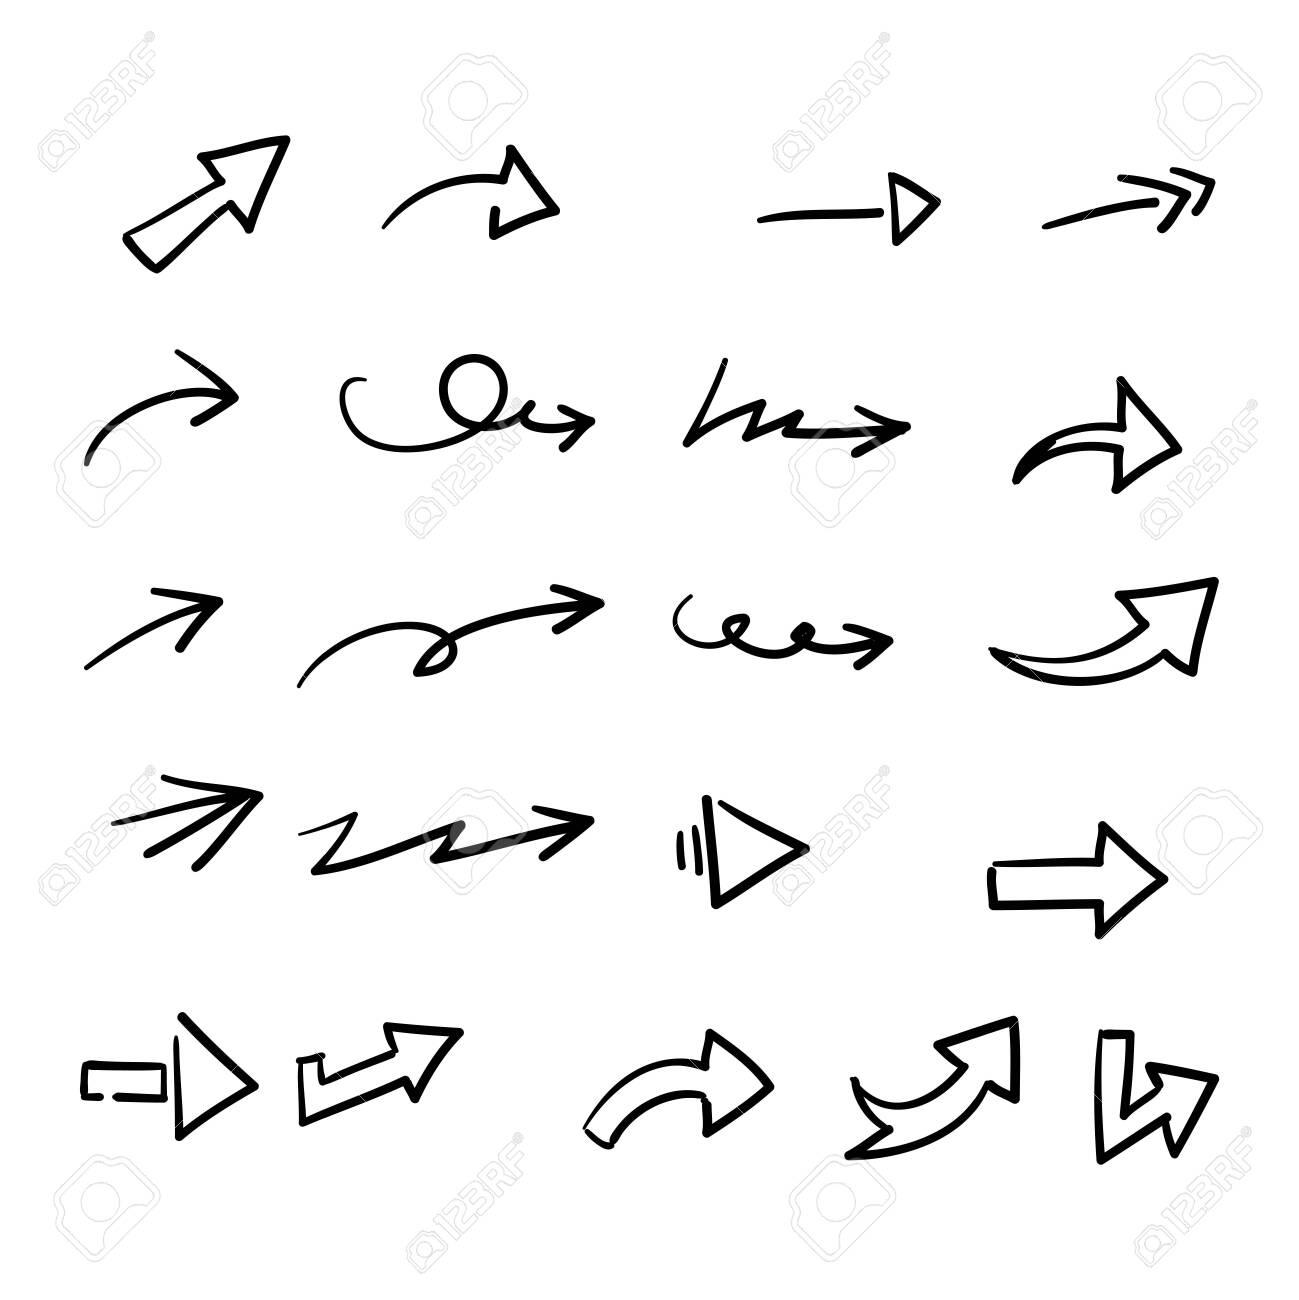 hand drawn doodle arrow collection icon vector - 153517566